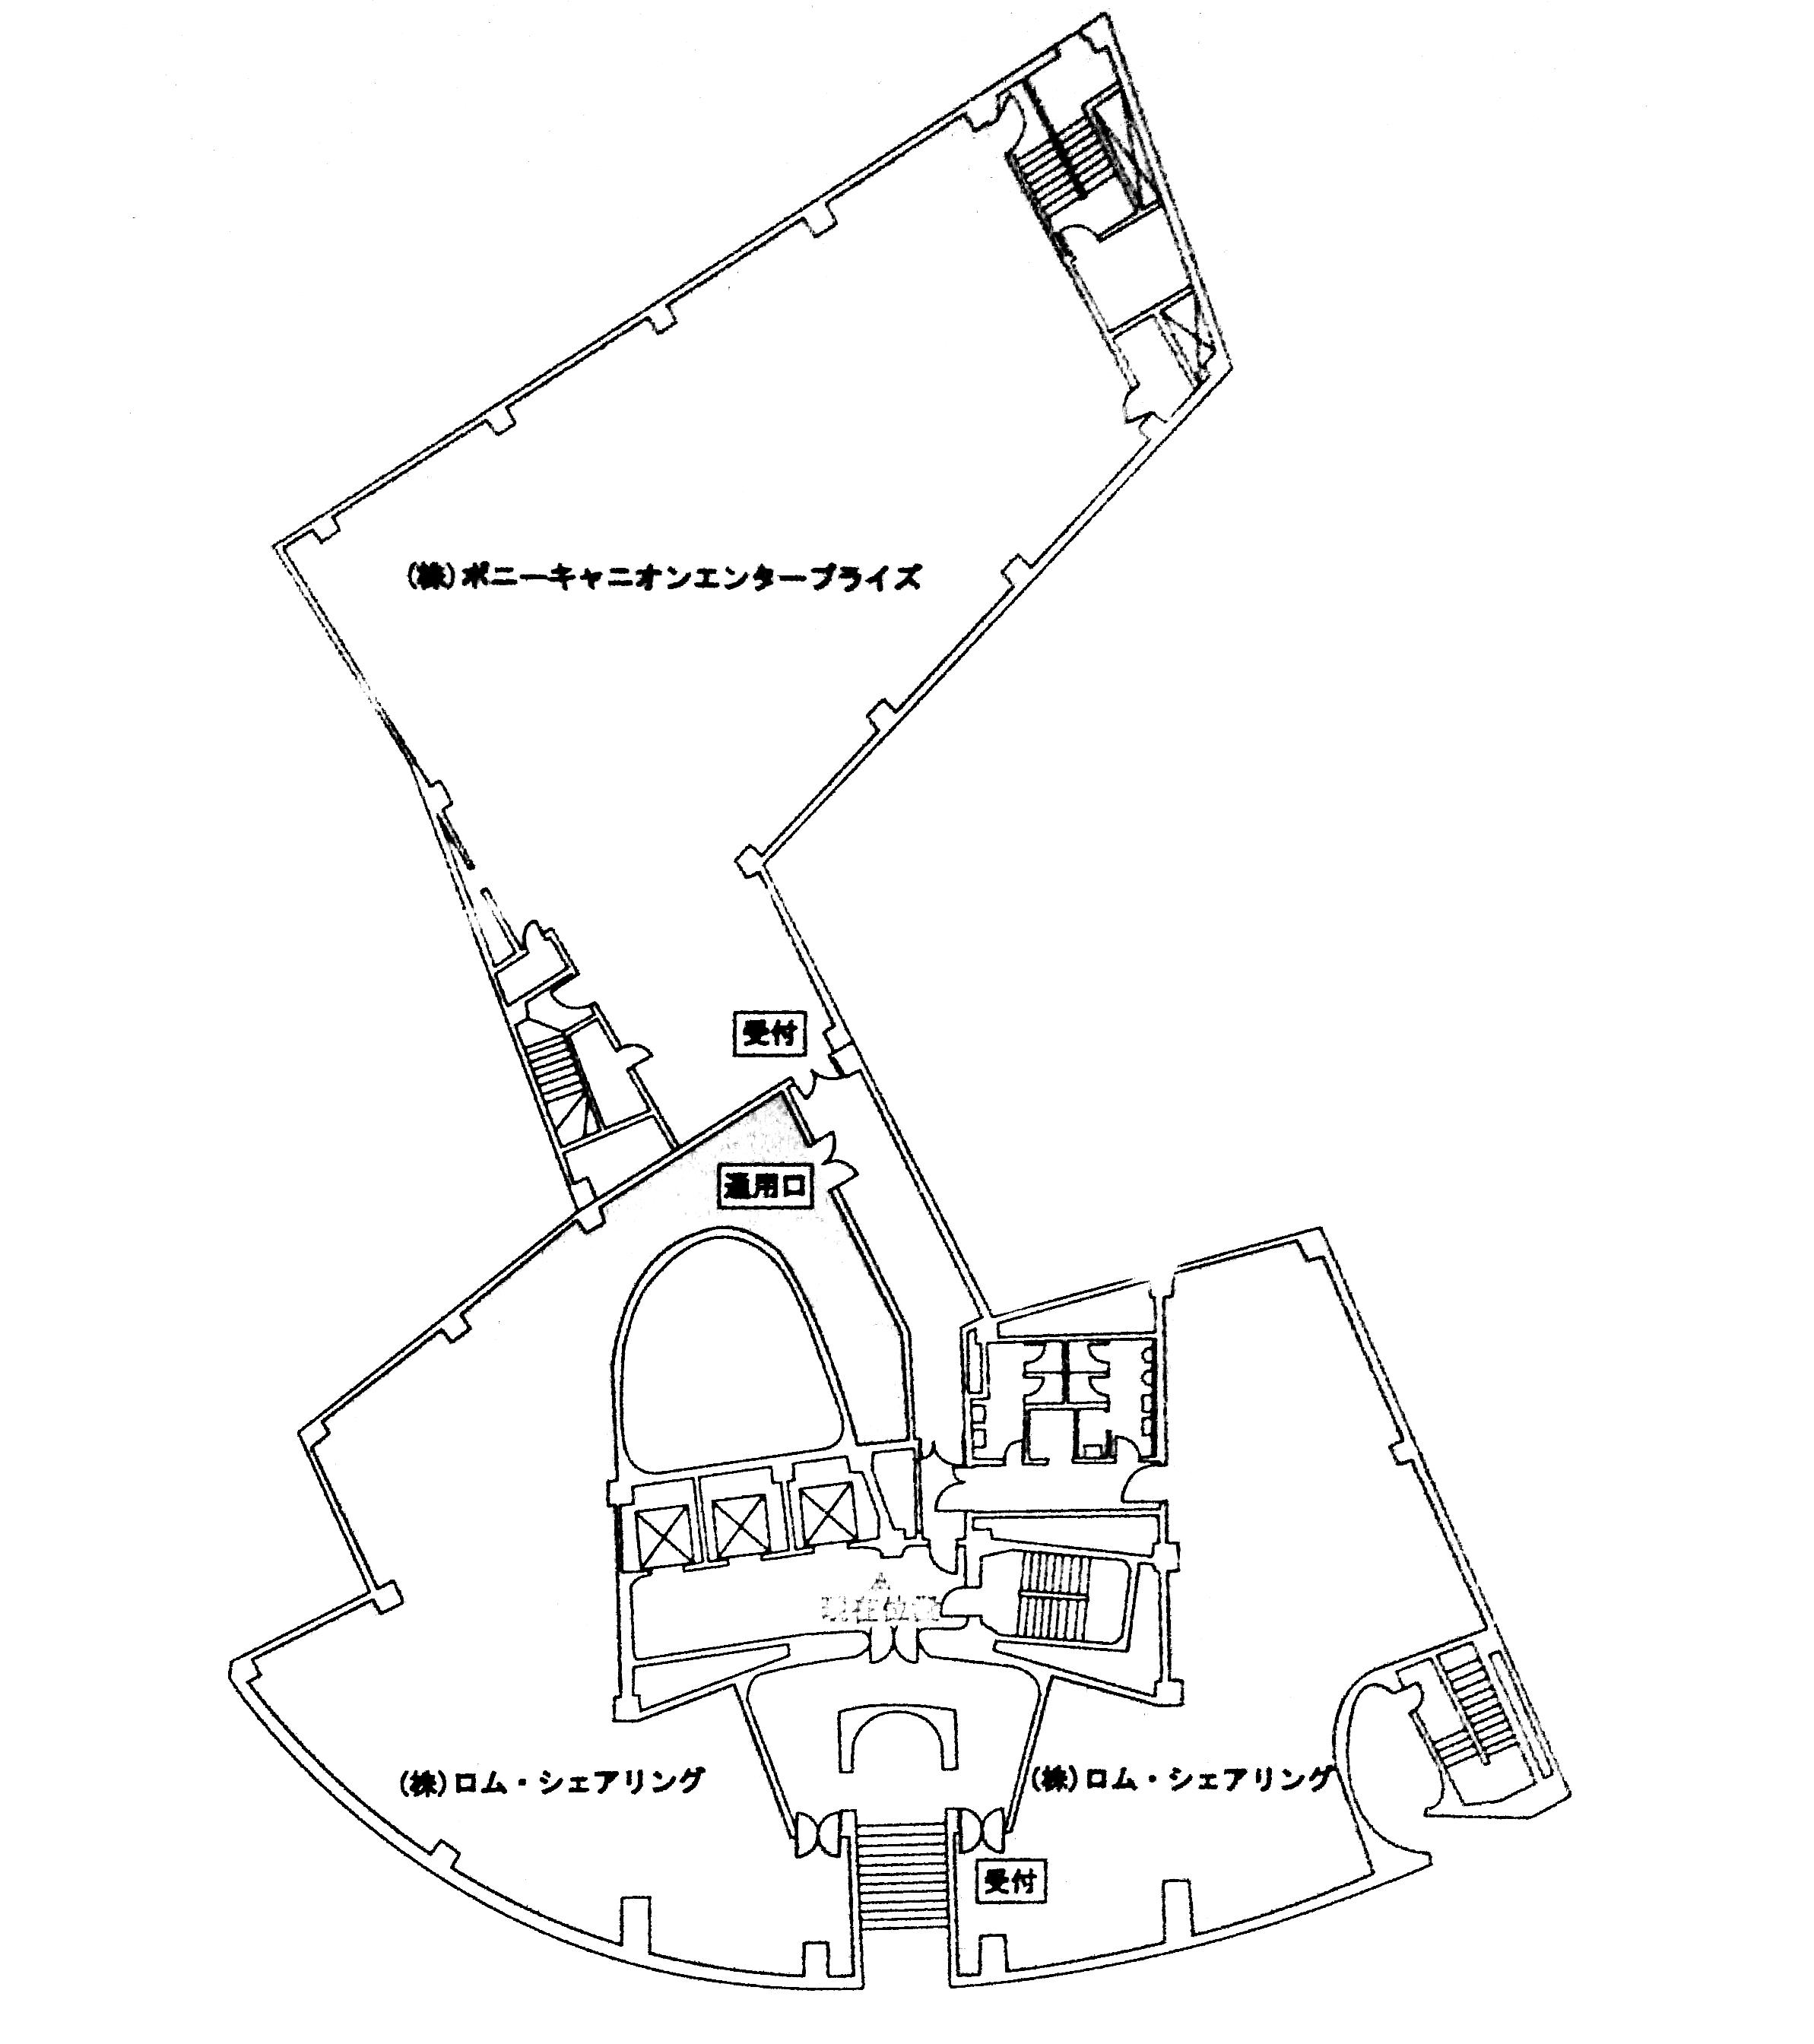 1974 – Noa Building – Seiichi Shirai